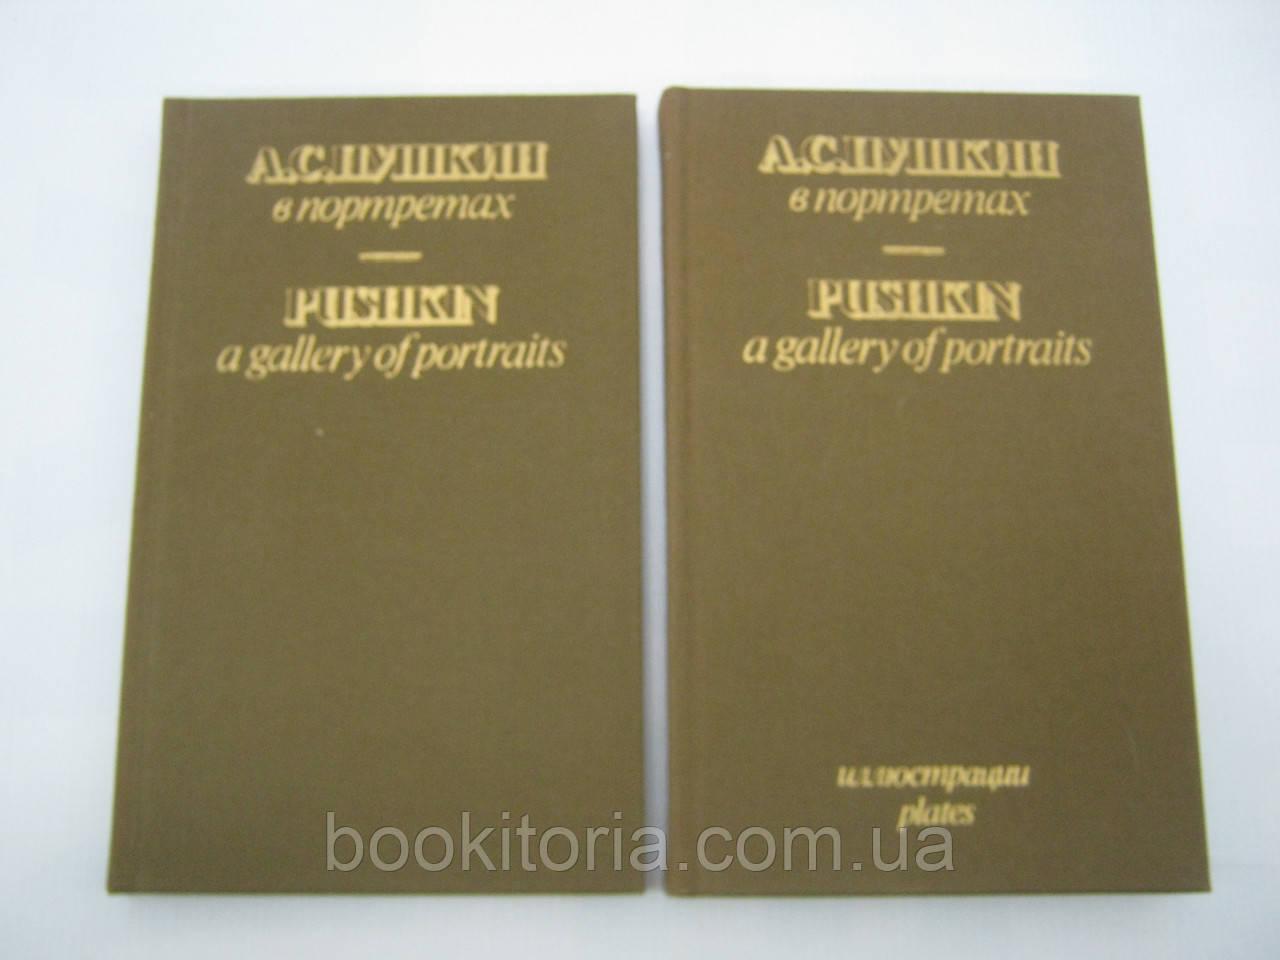 А.С. Пушкин в портретах. В 2-х томах (б/у).